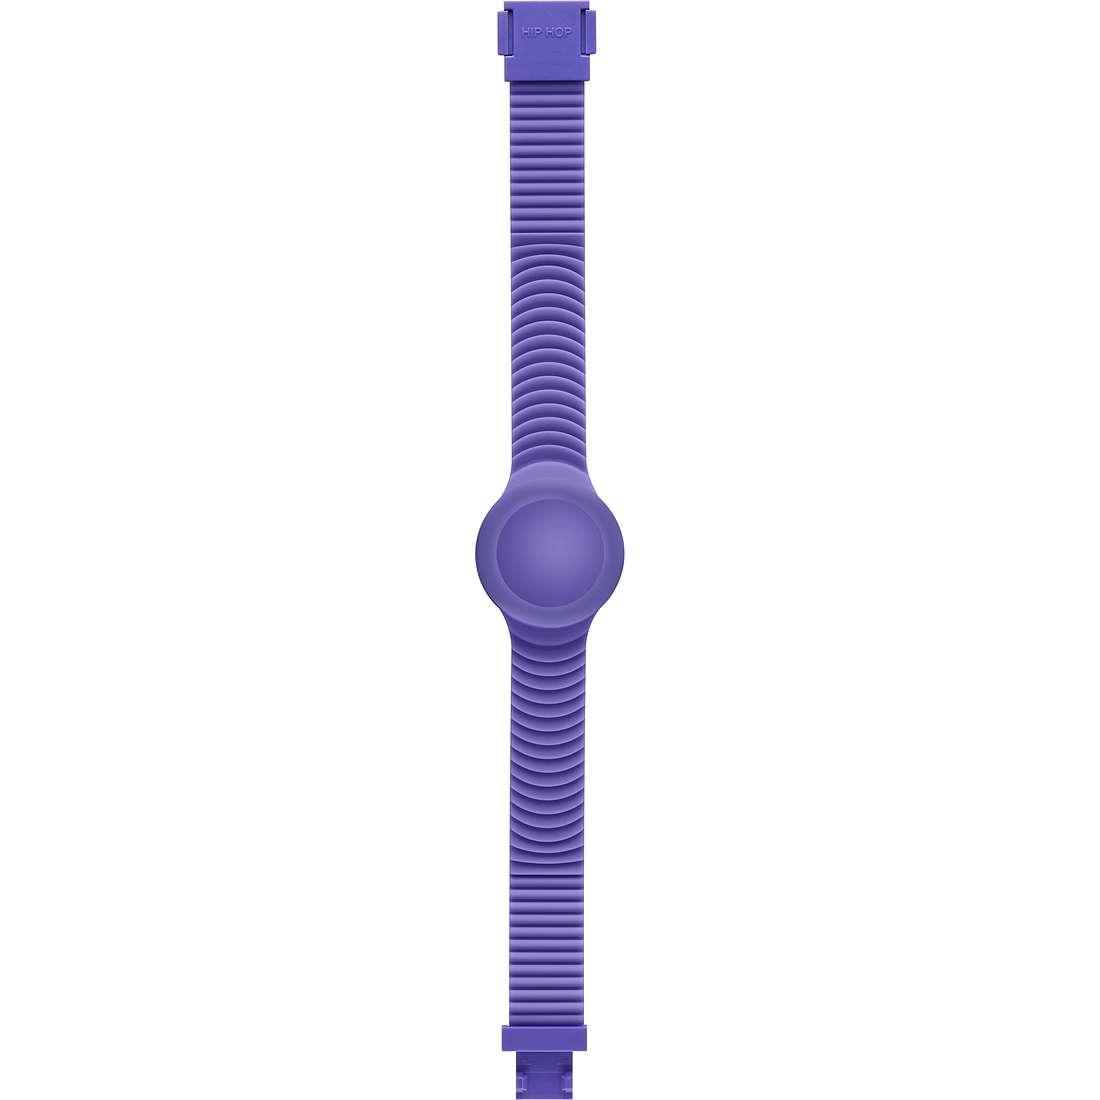 orologio accessorio donna Hip Hop Sensoriality HBU0518